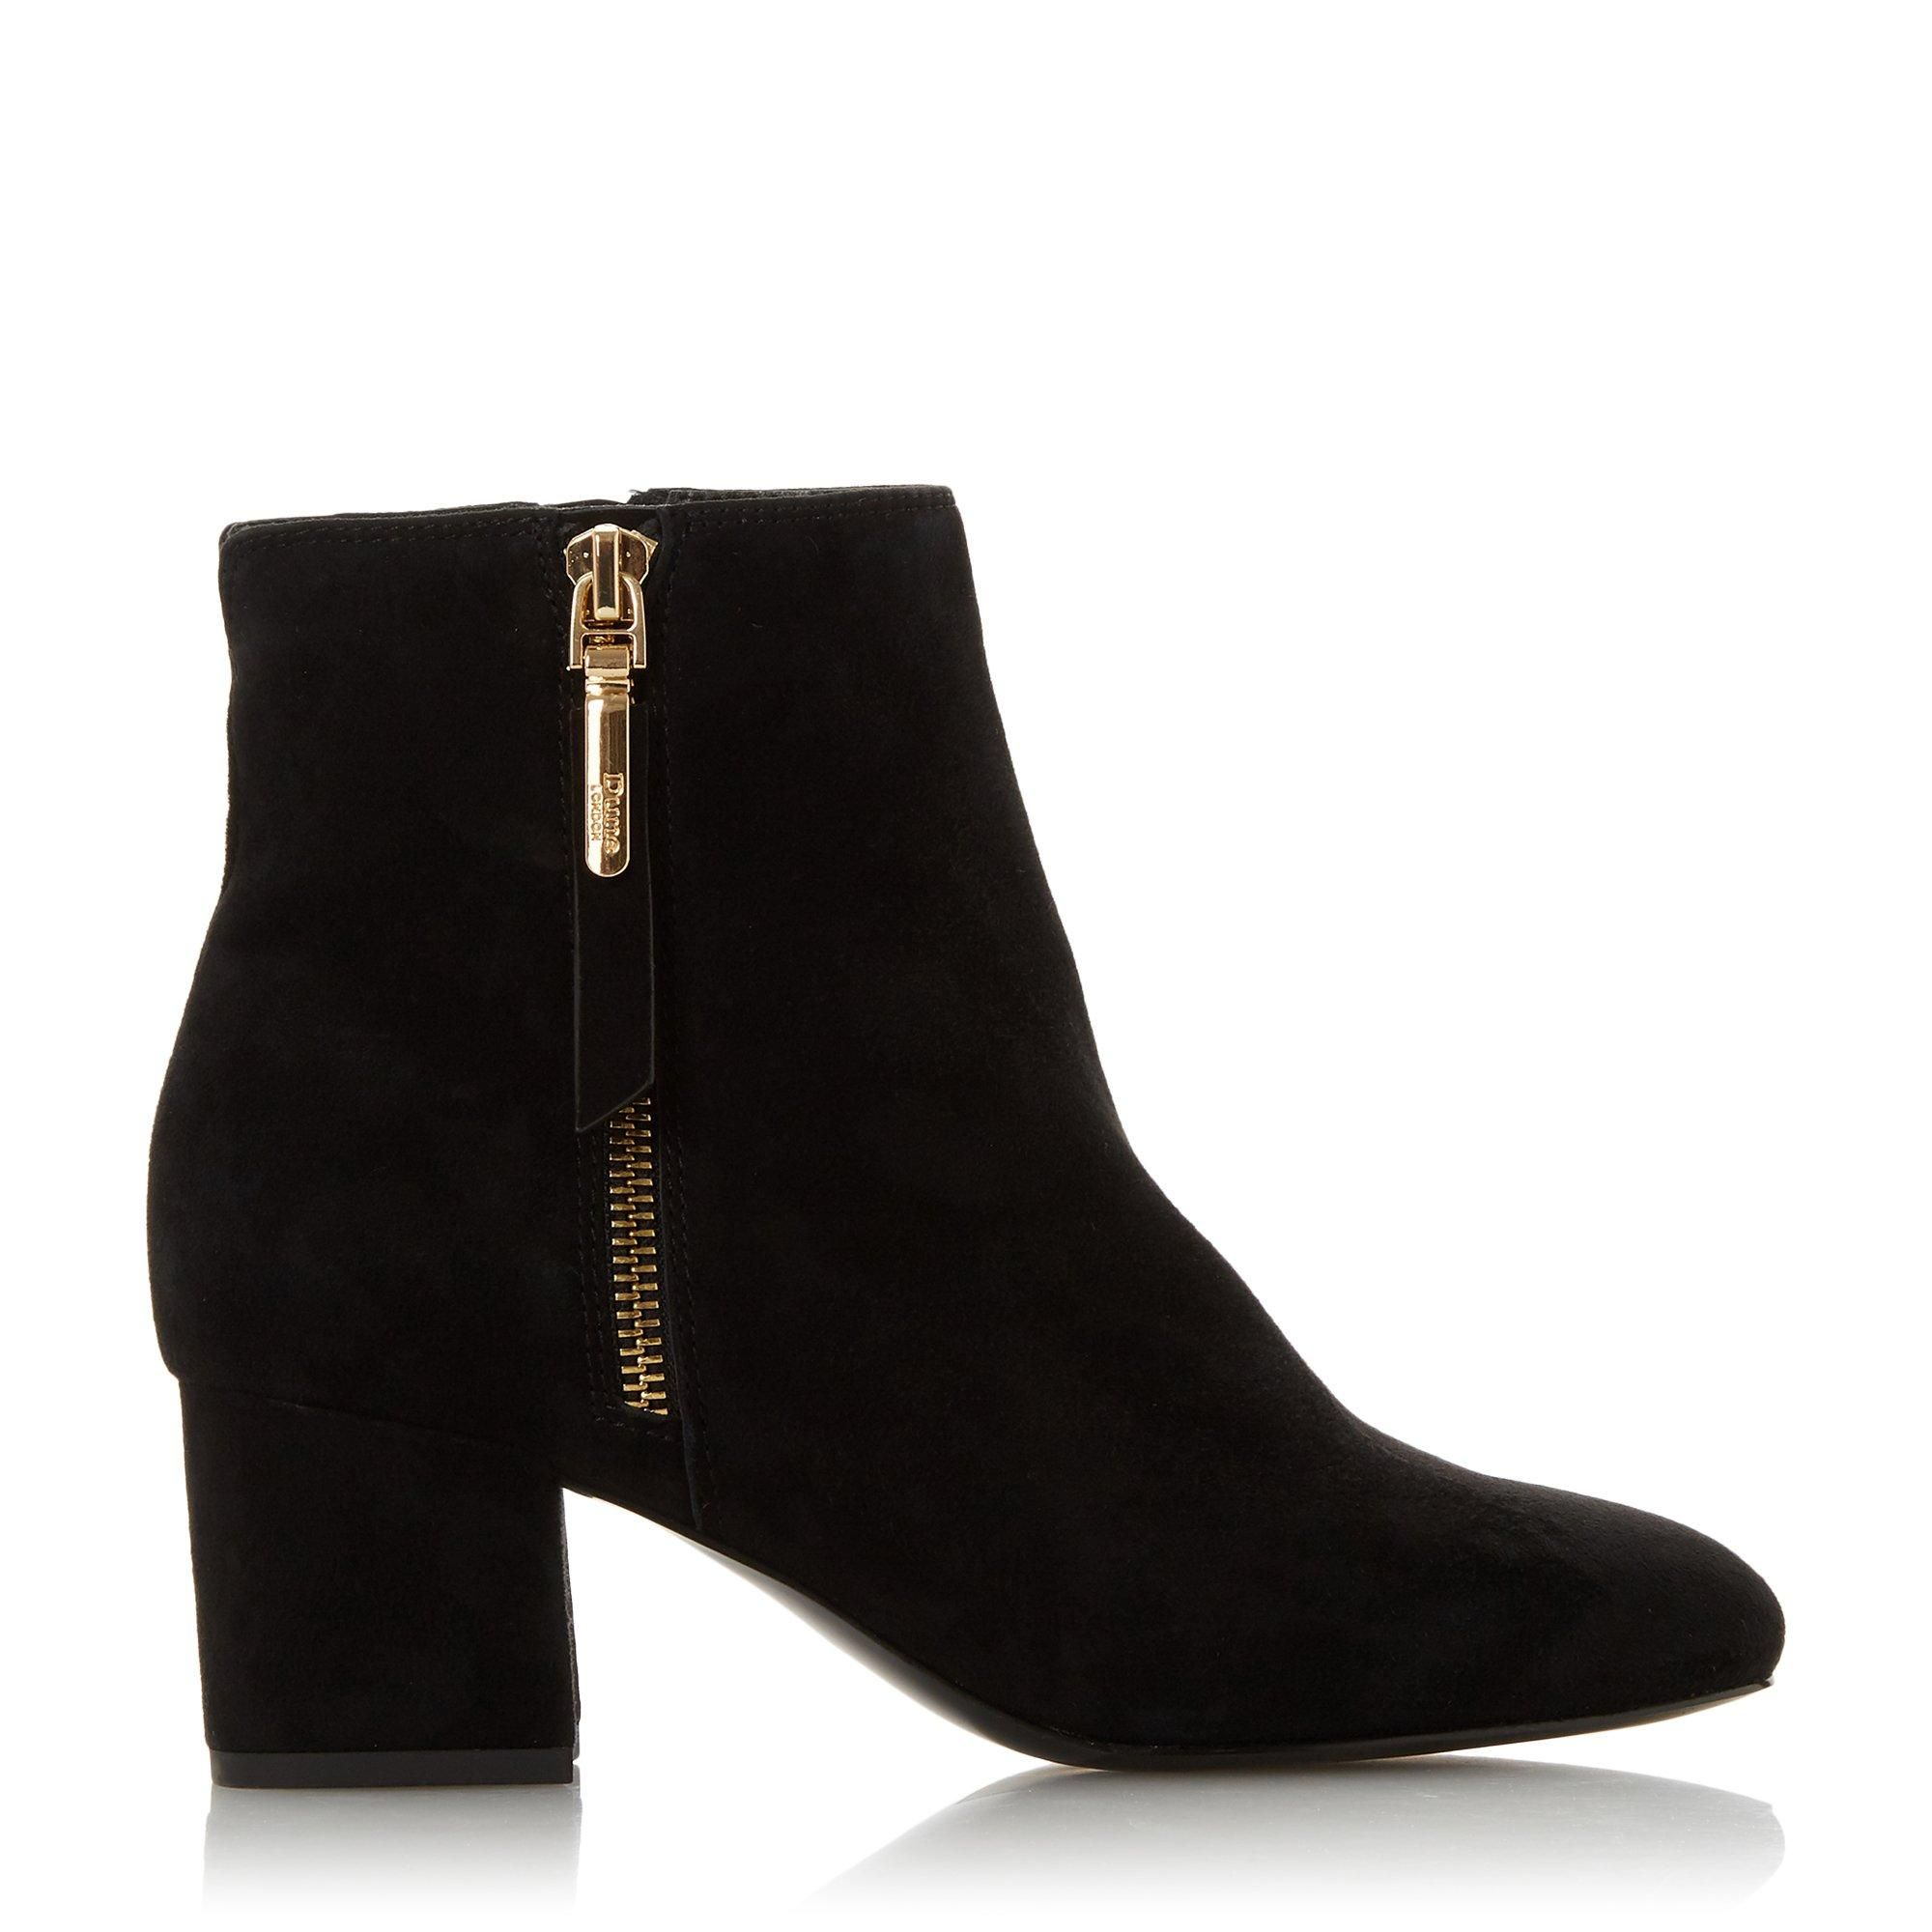 Dune Ladies ORLLA Side Zip Ankle Boots